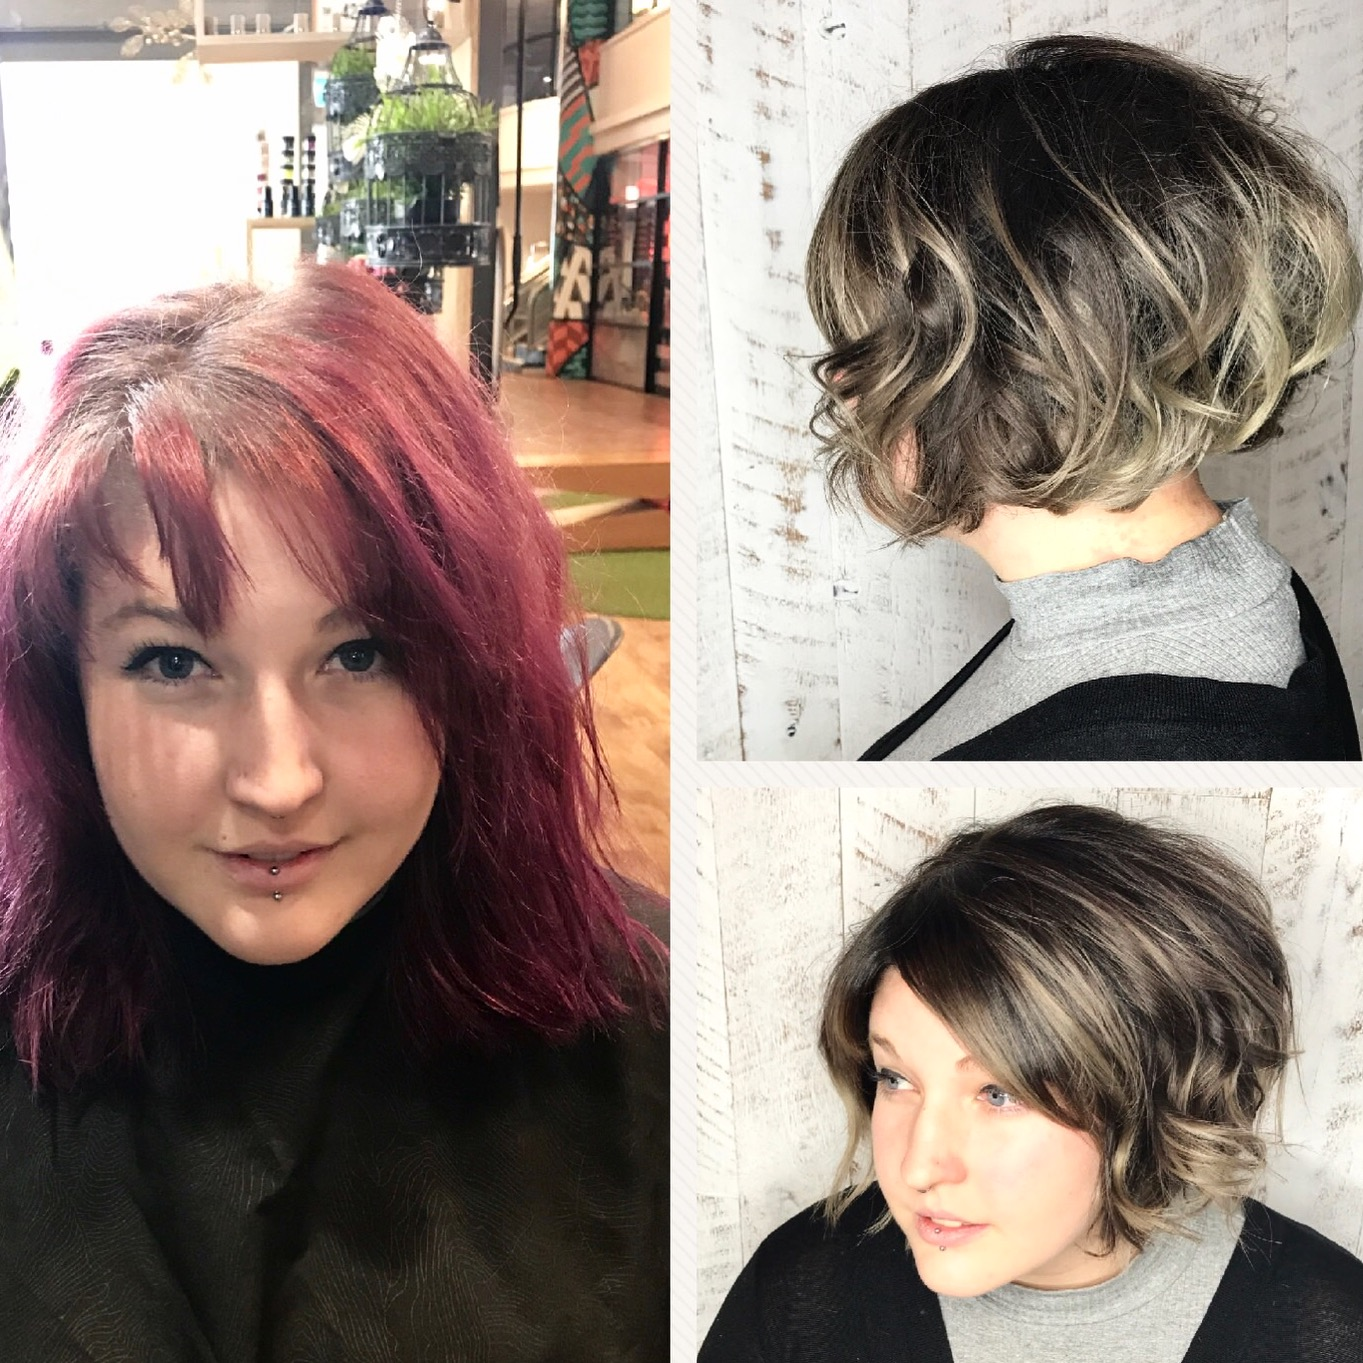 Siver/grey hair